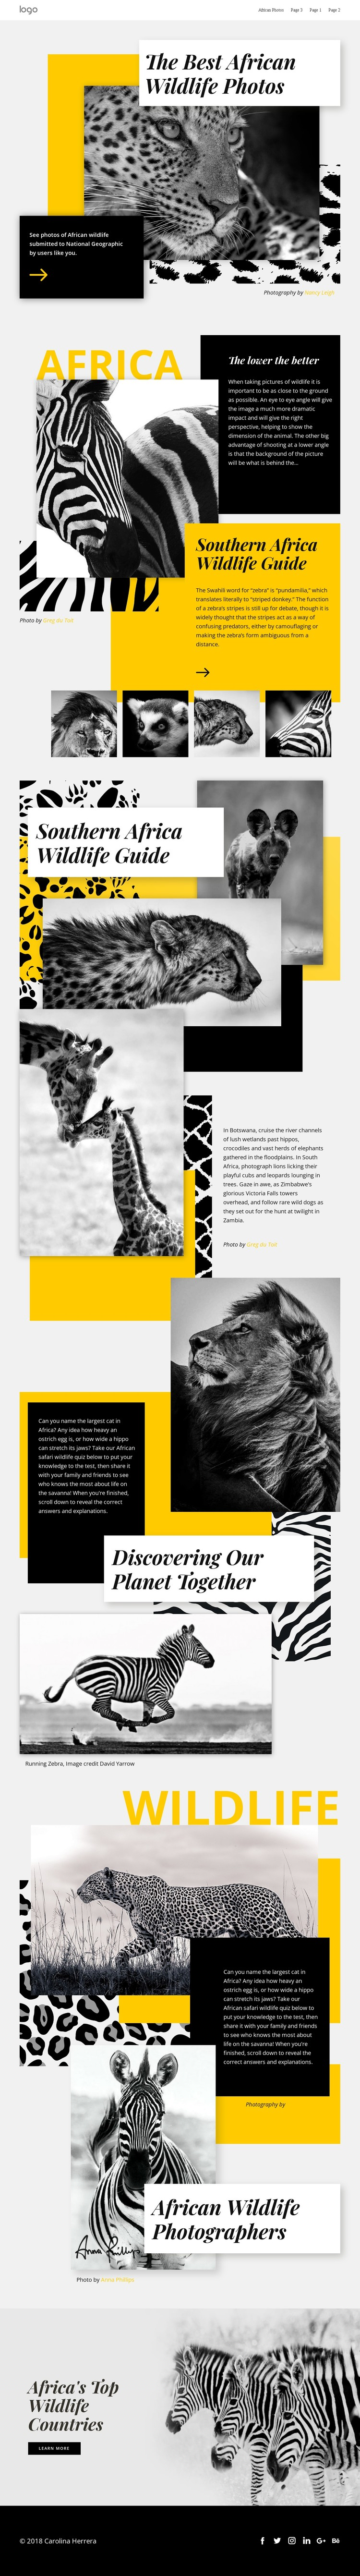 Best African Photos Static Site Generator